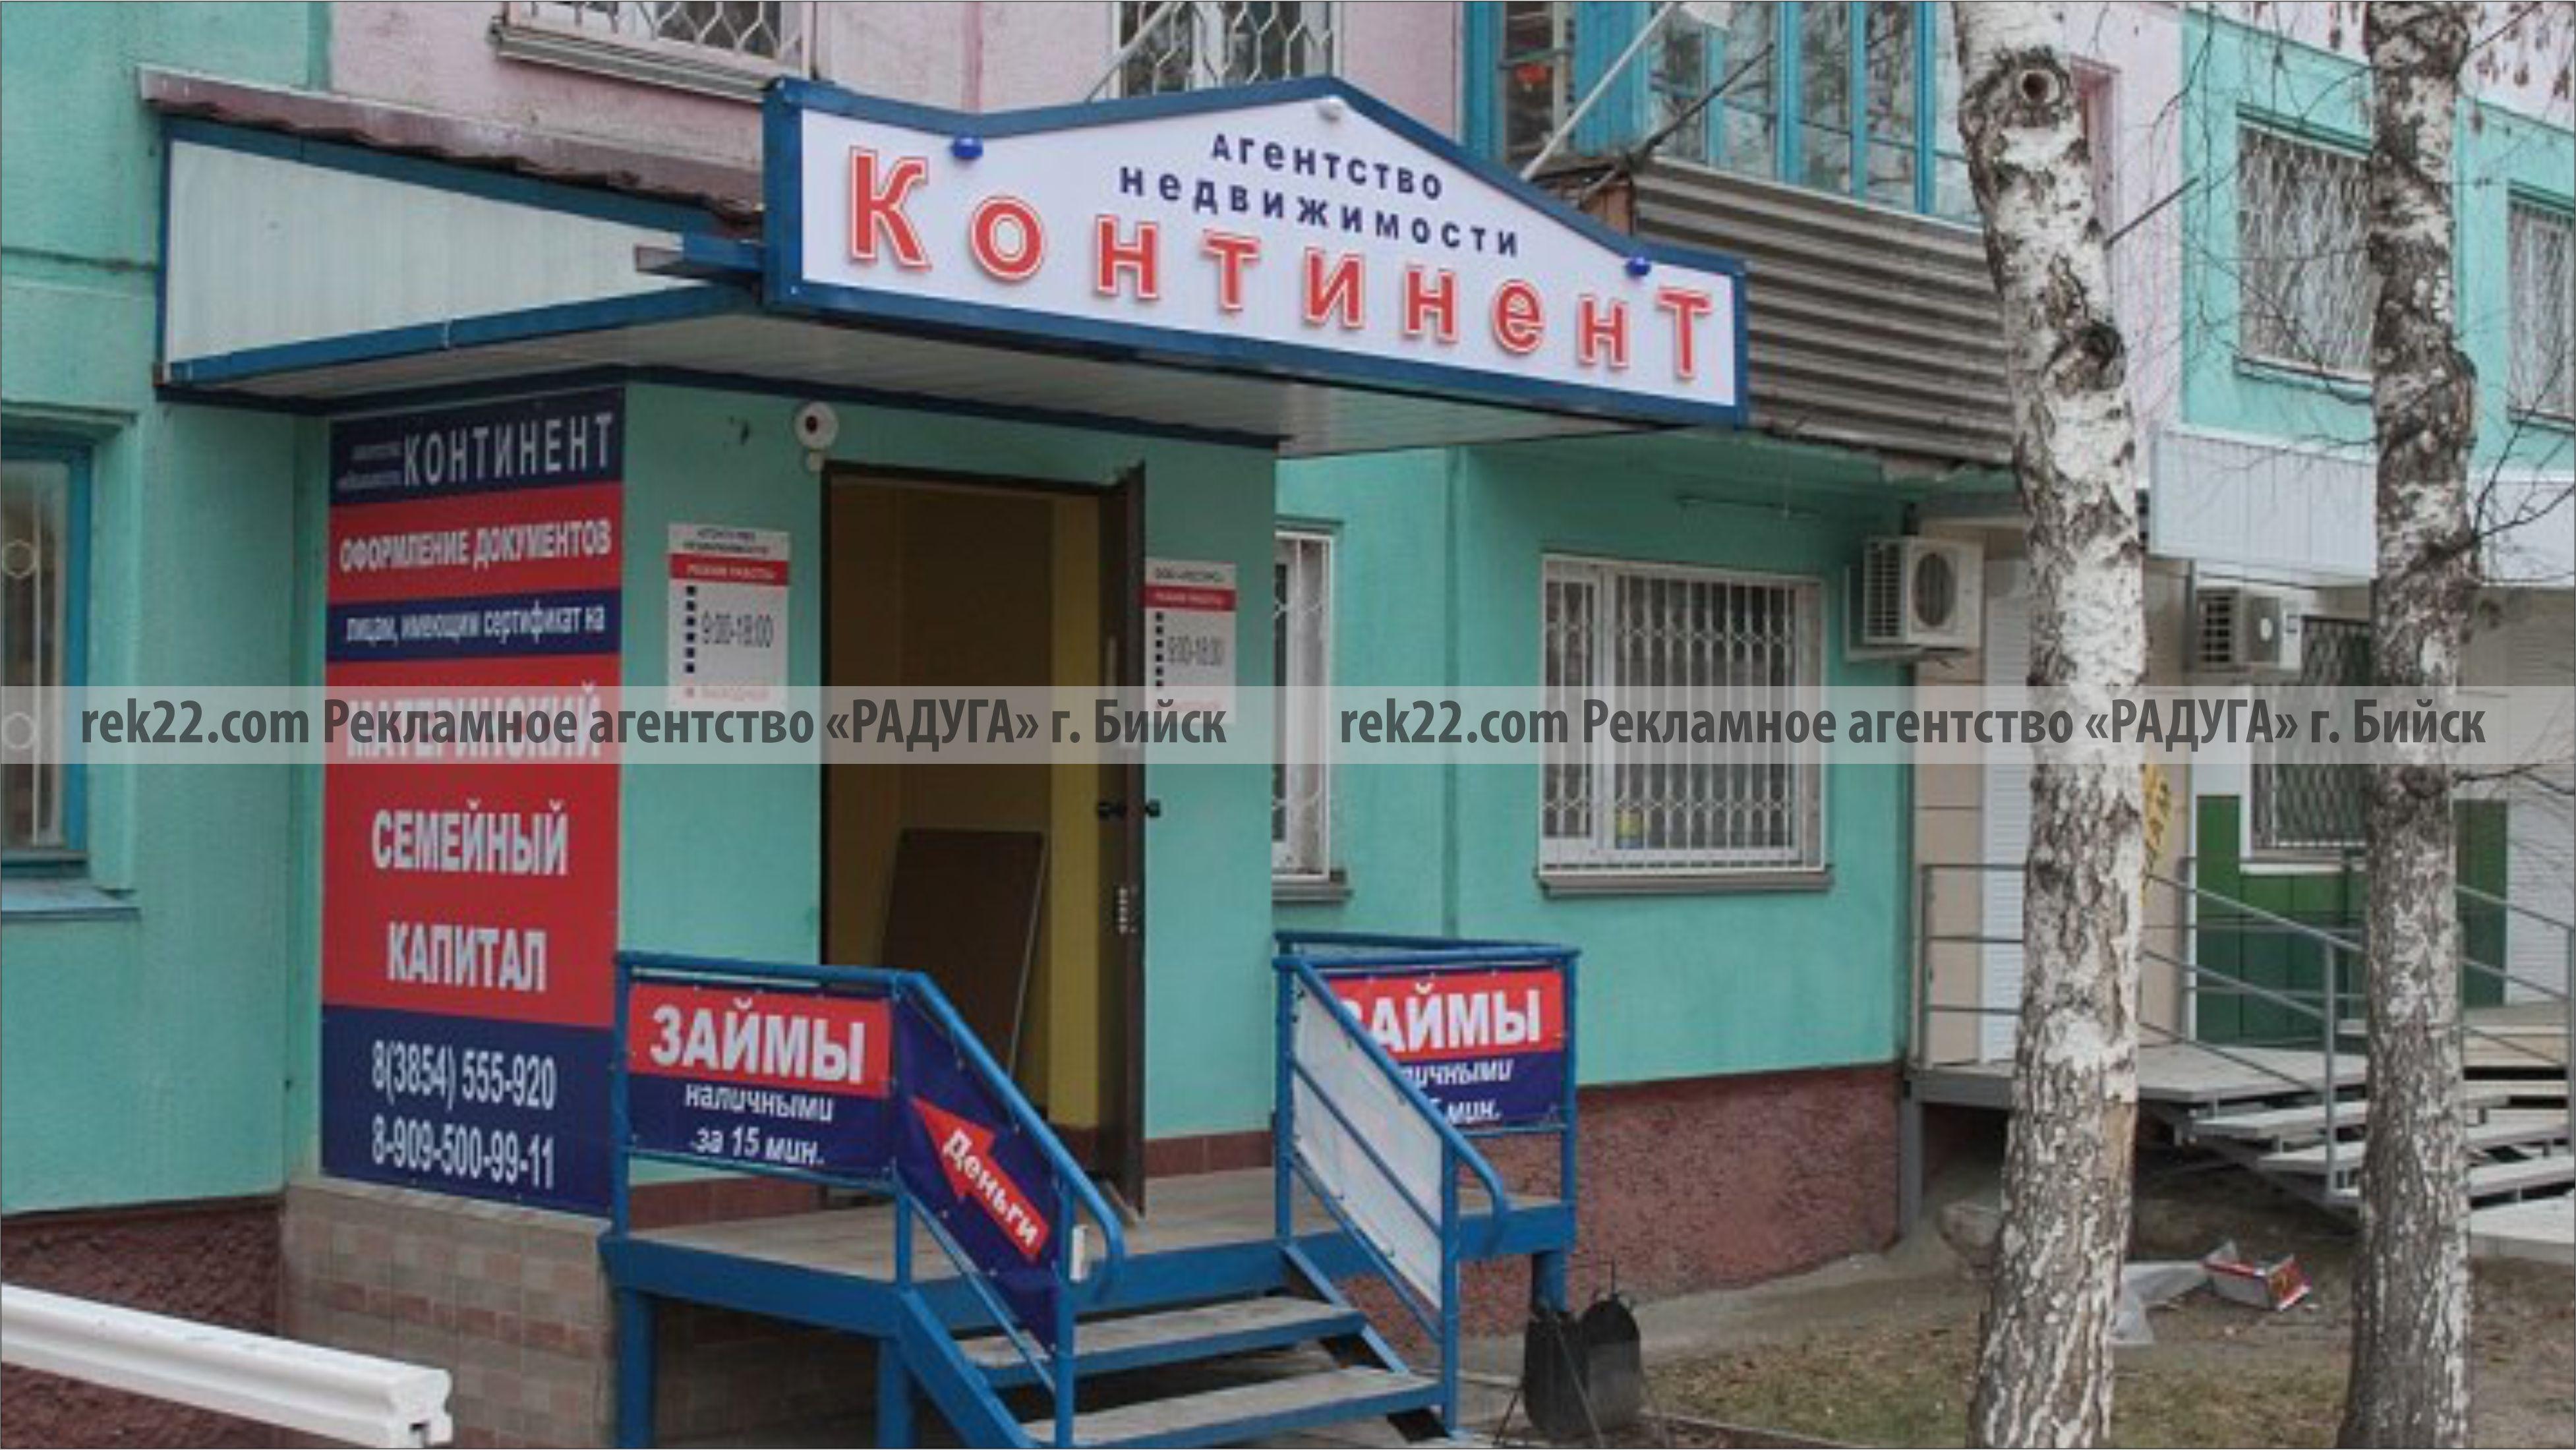 Реклама на транспорте Бийск - вывески, баннера, ПВХ - 7